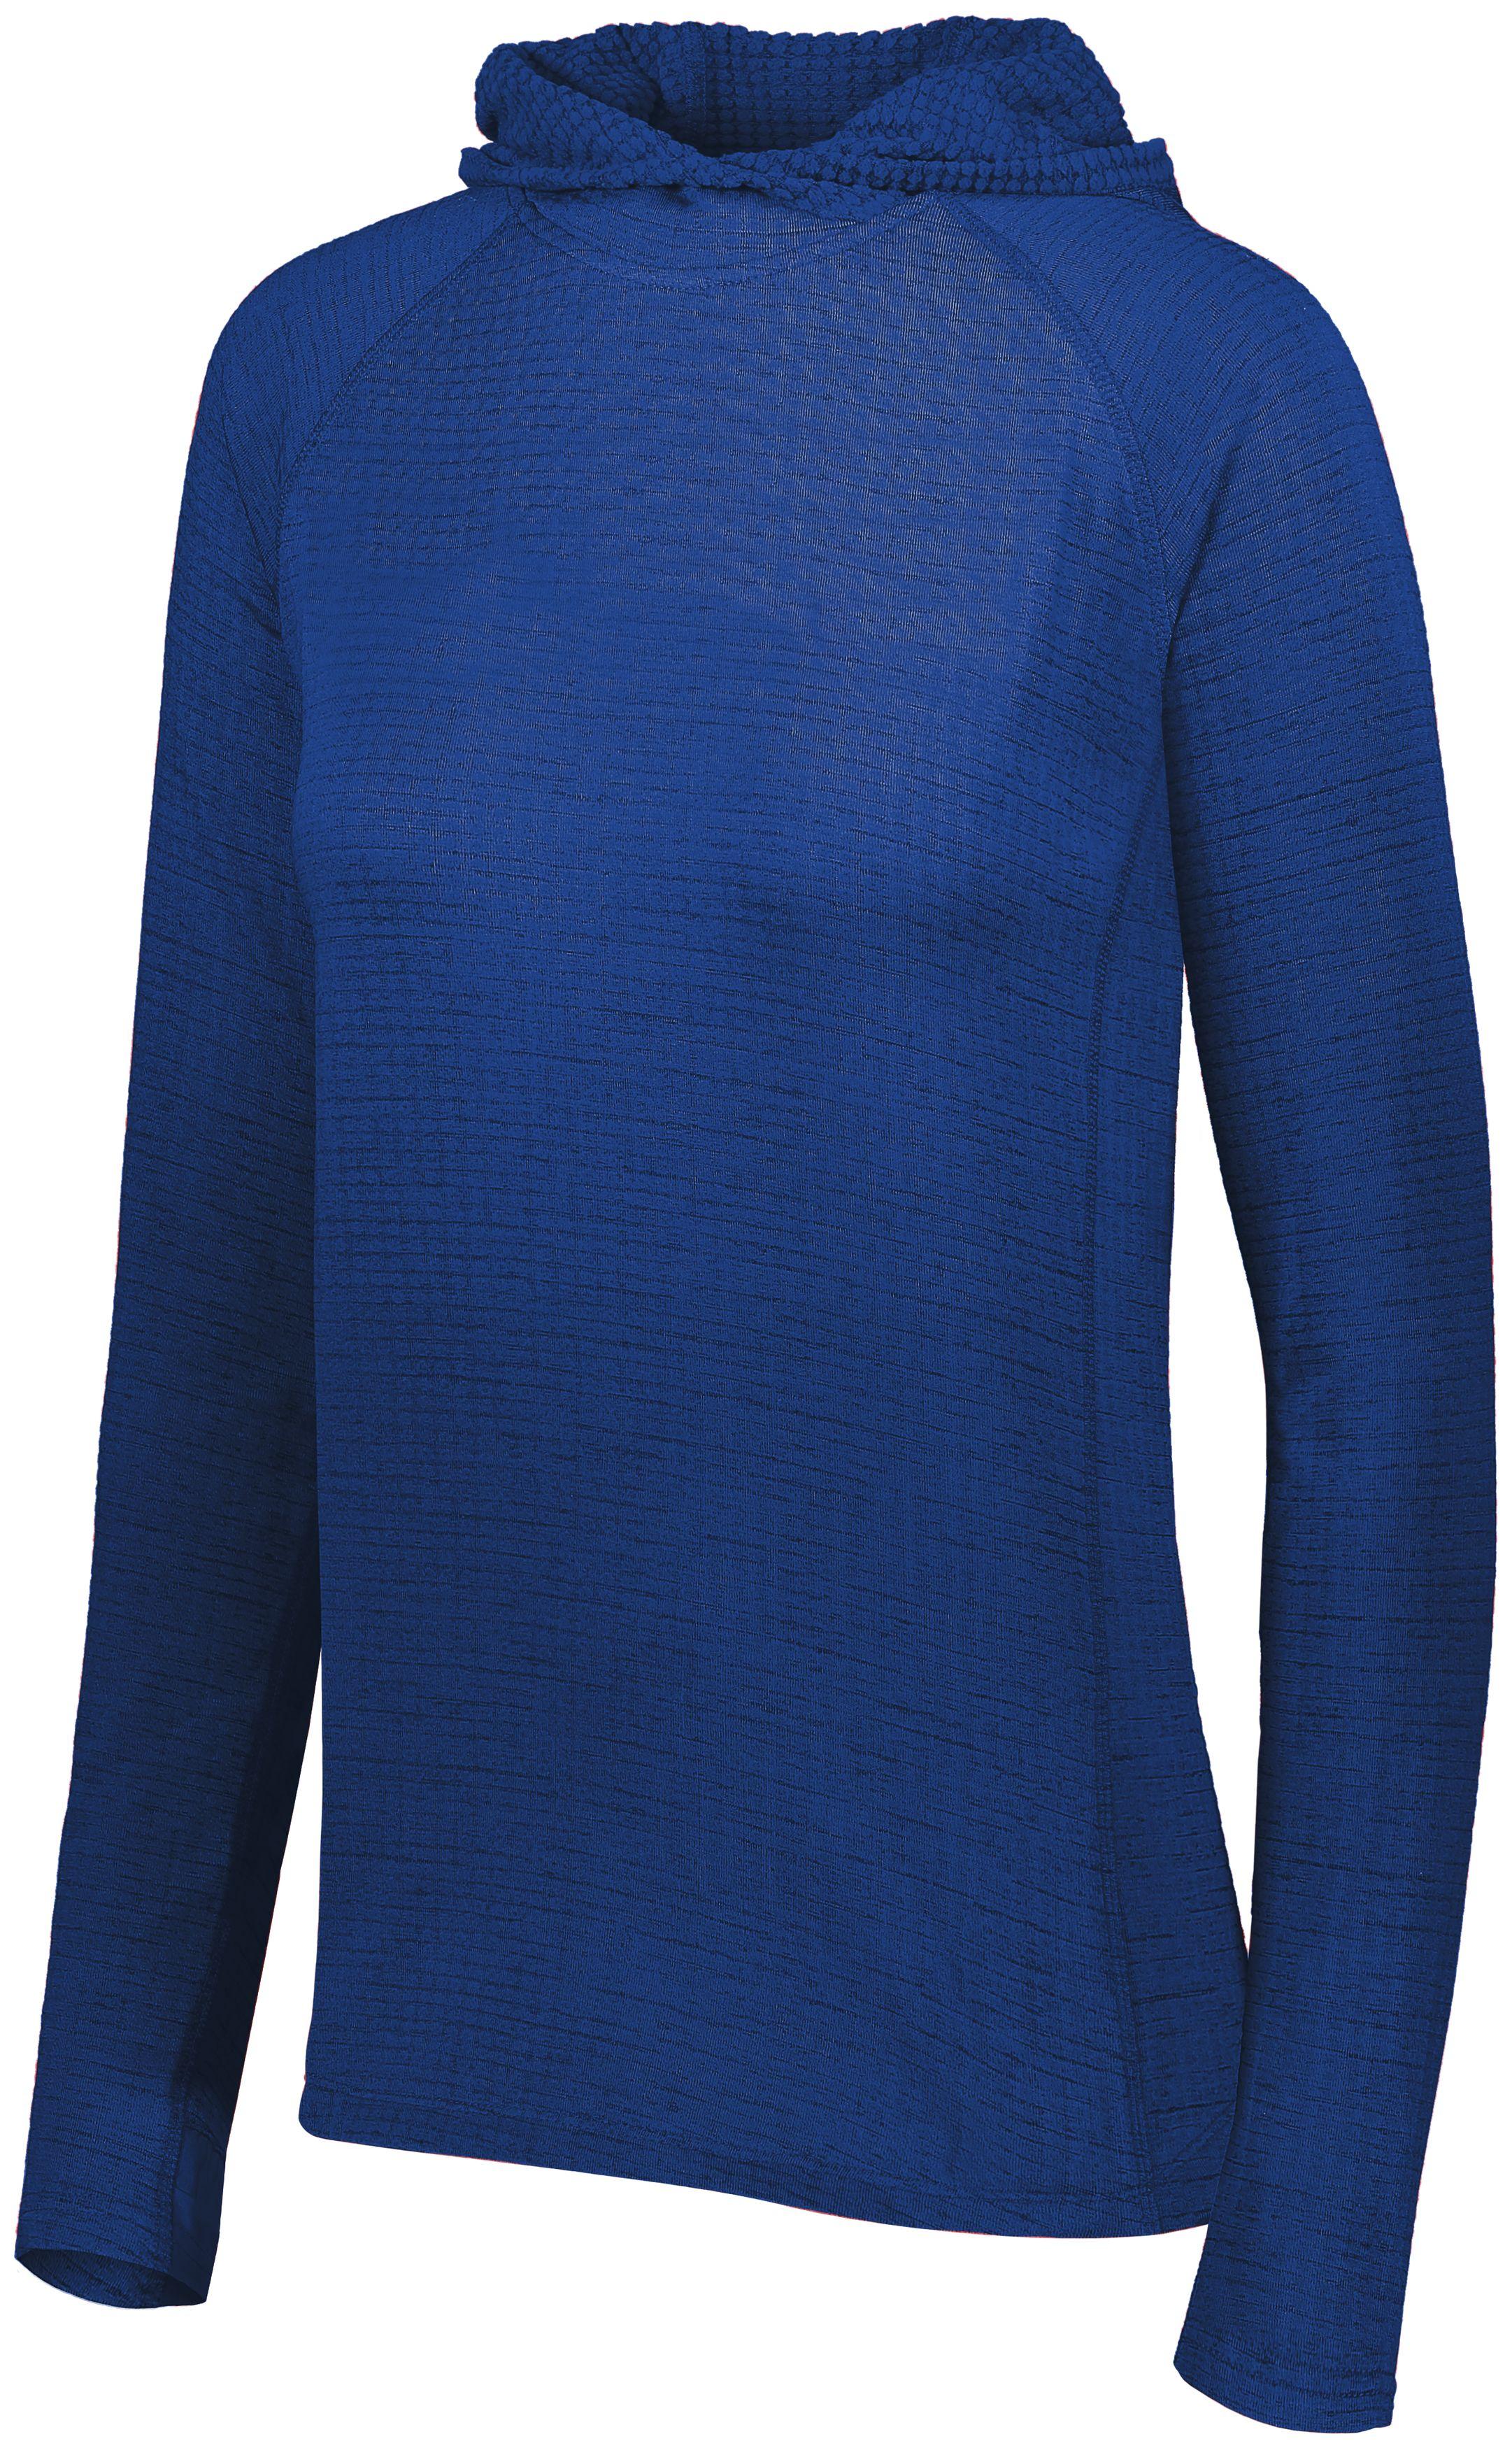 Ladies 3D Regulate Lightweight Pullover - ROYAL HEATHER